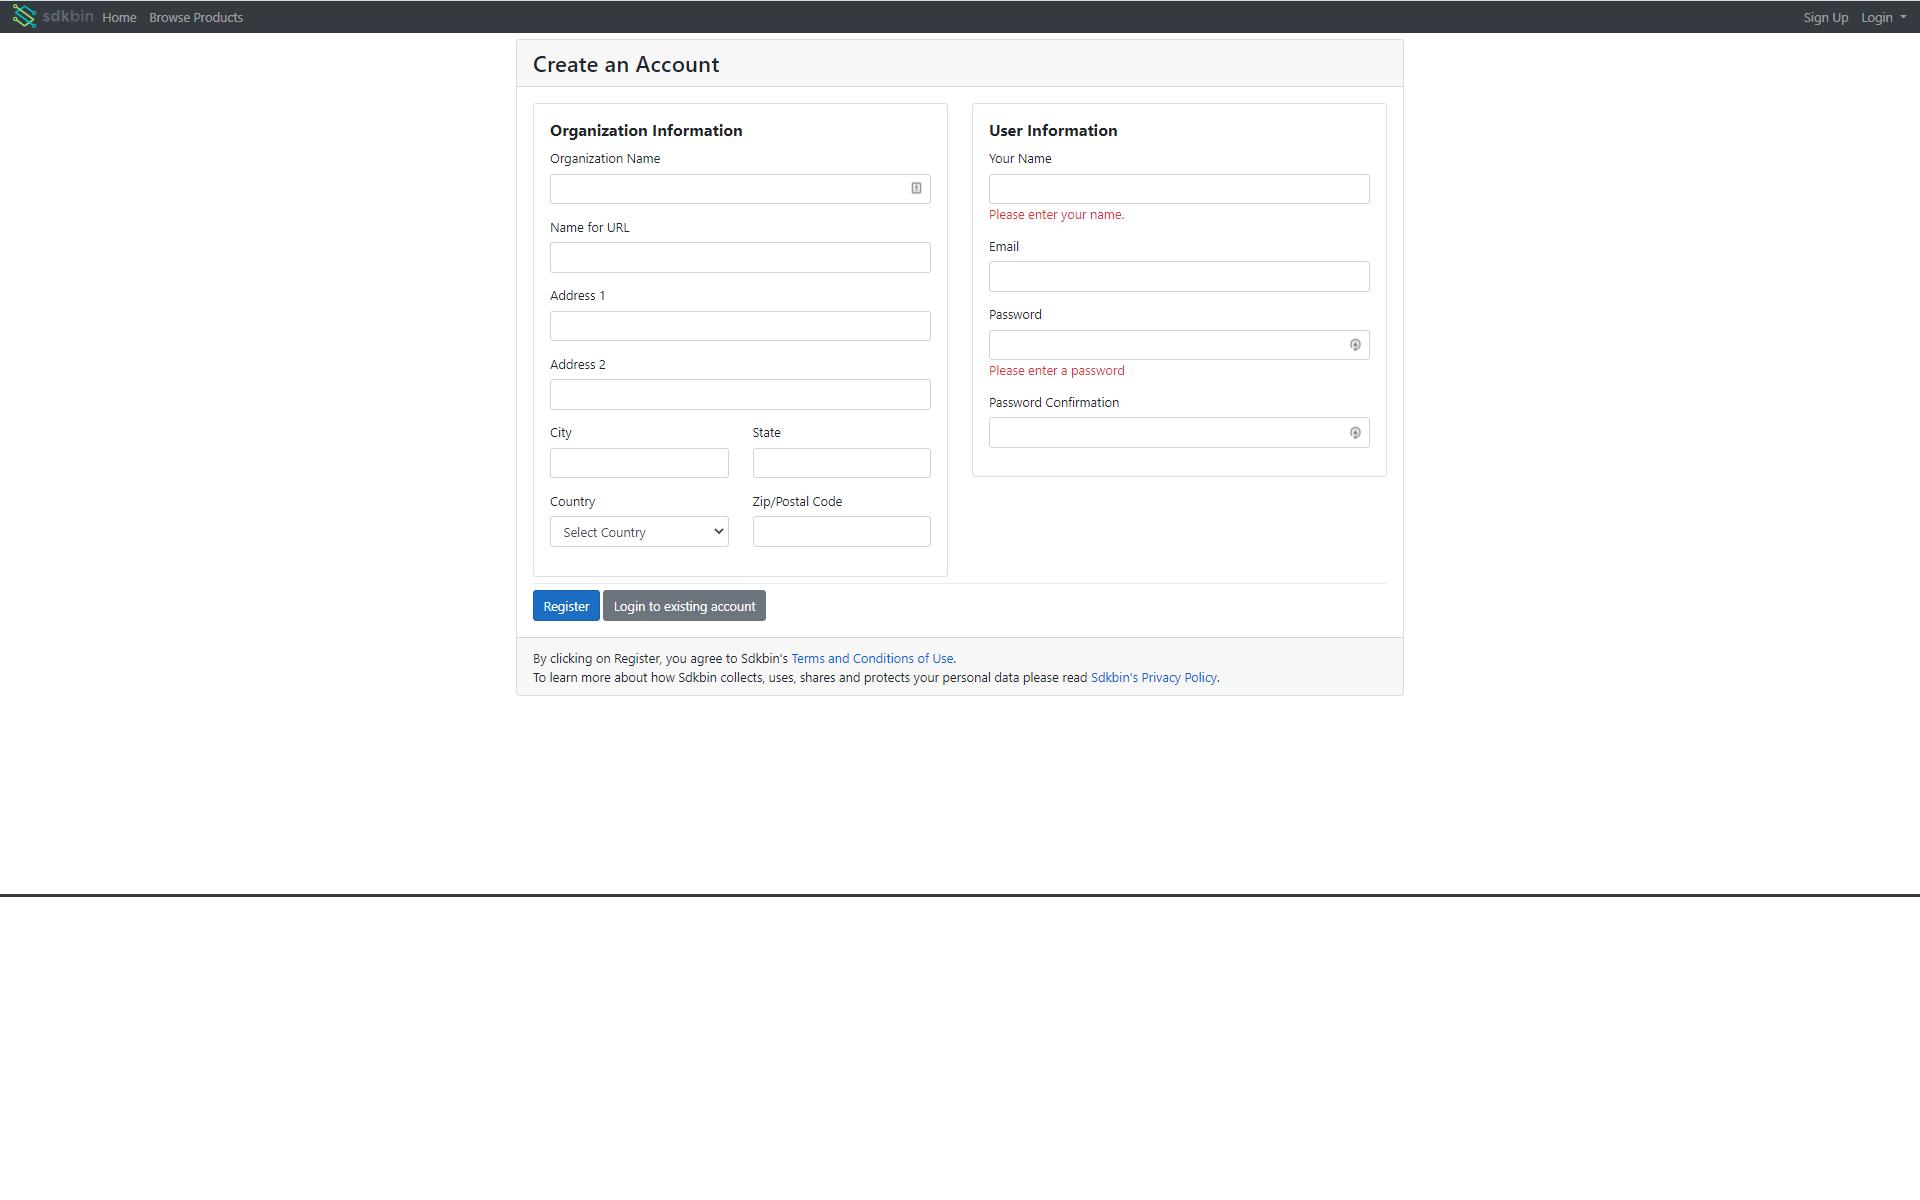 Sdkbin Account Registration Page